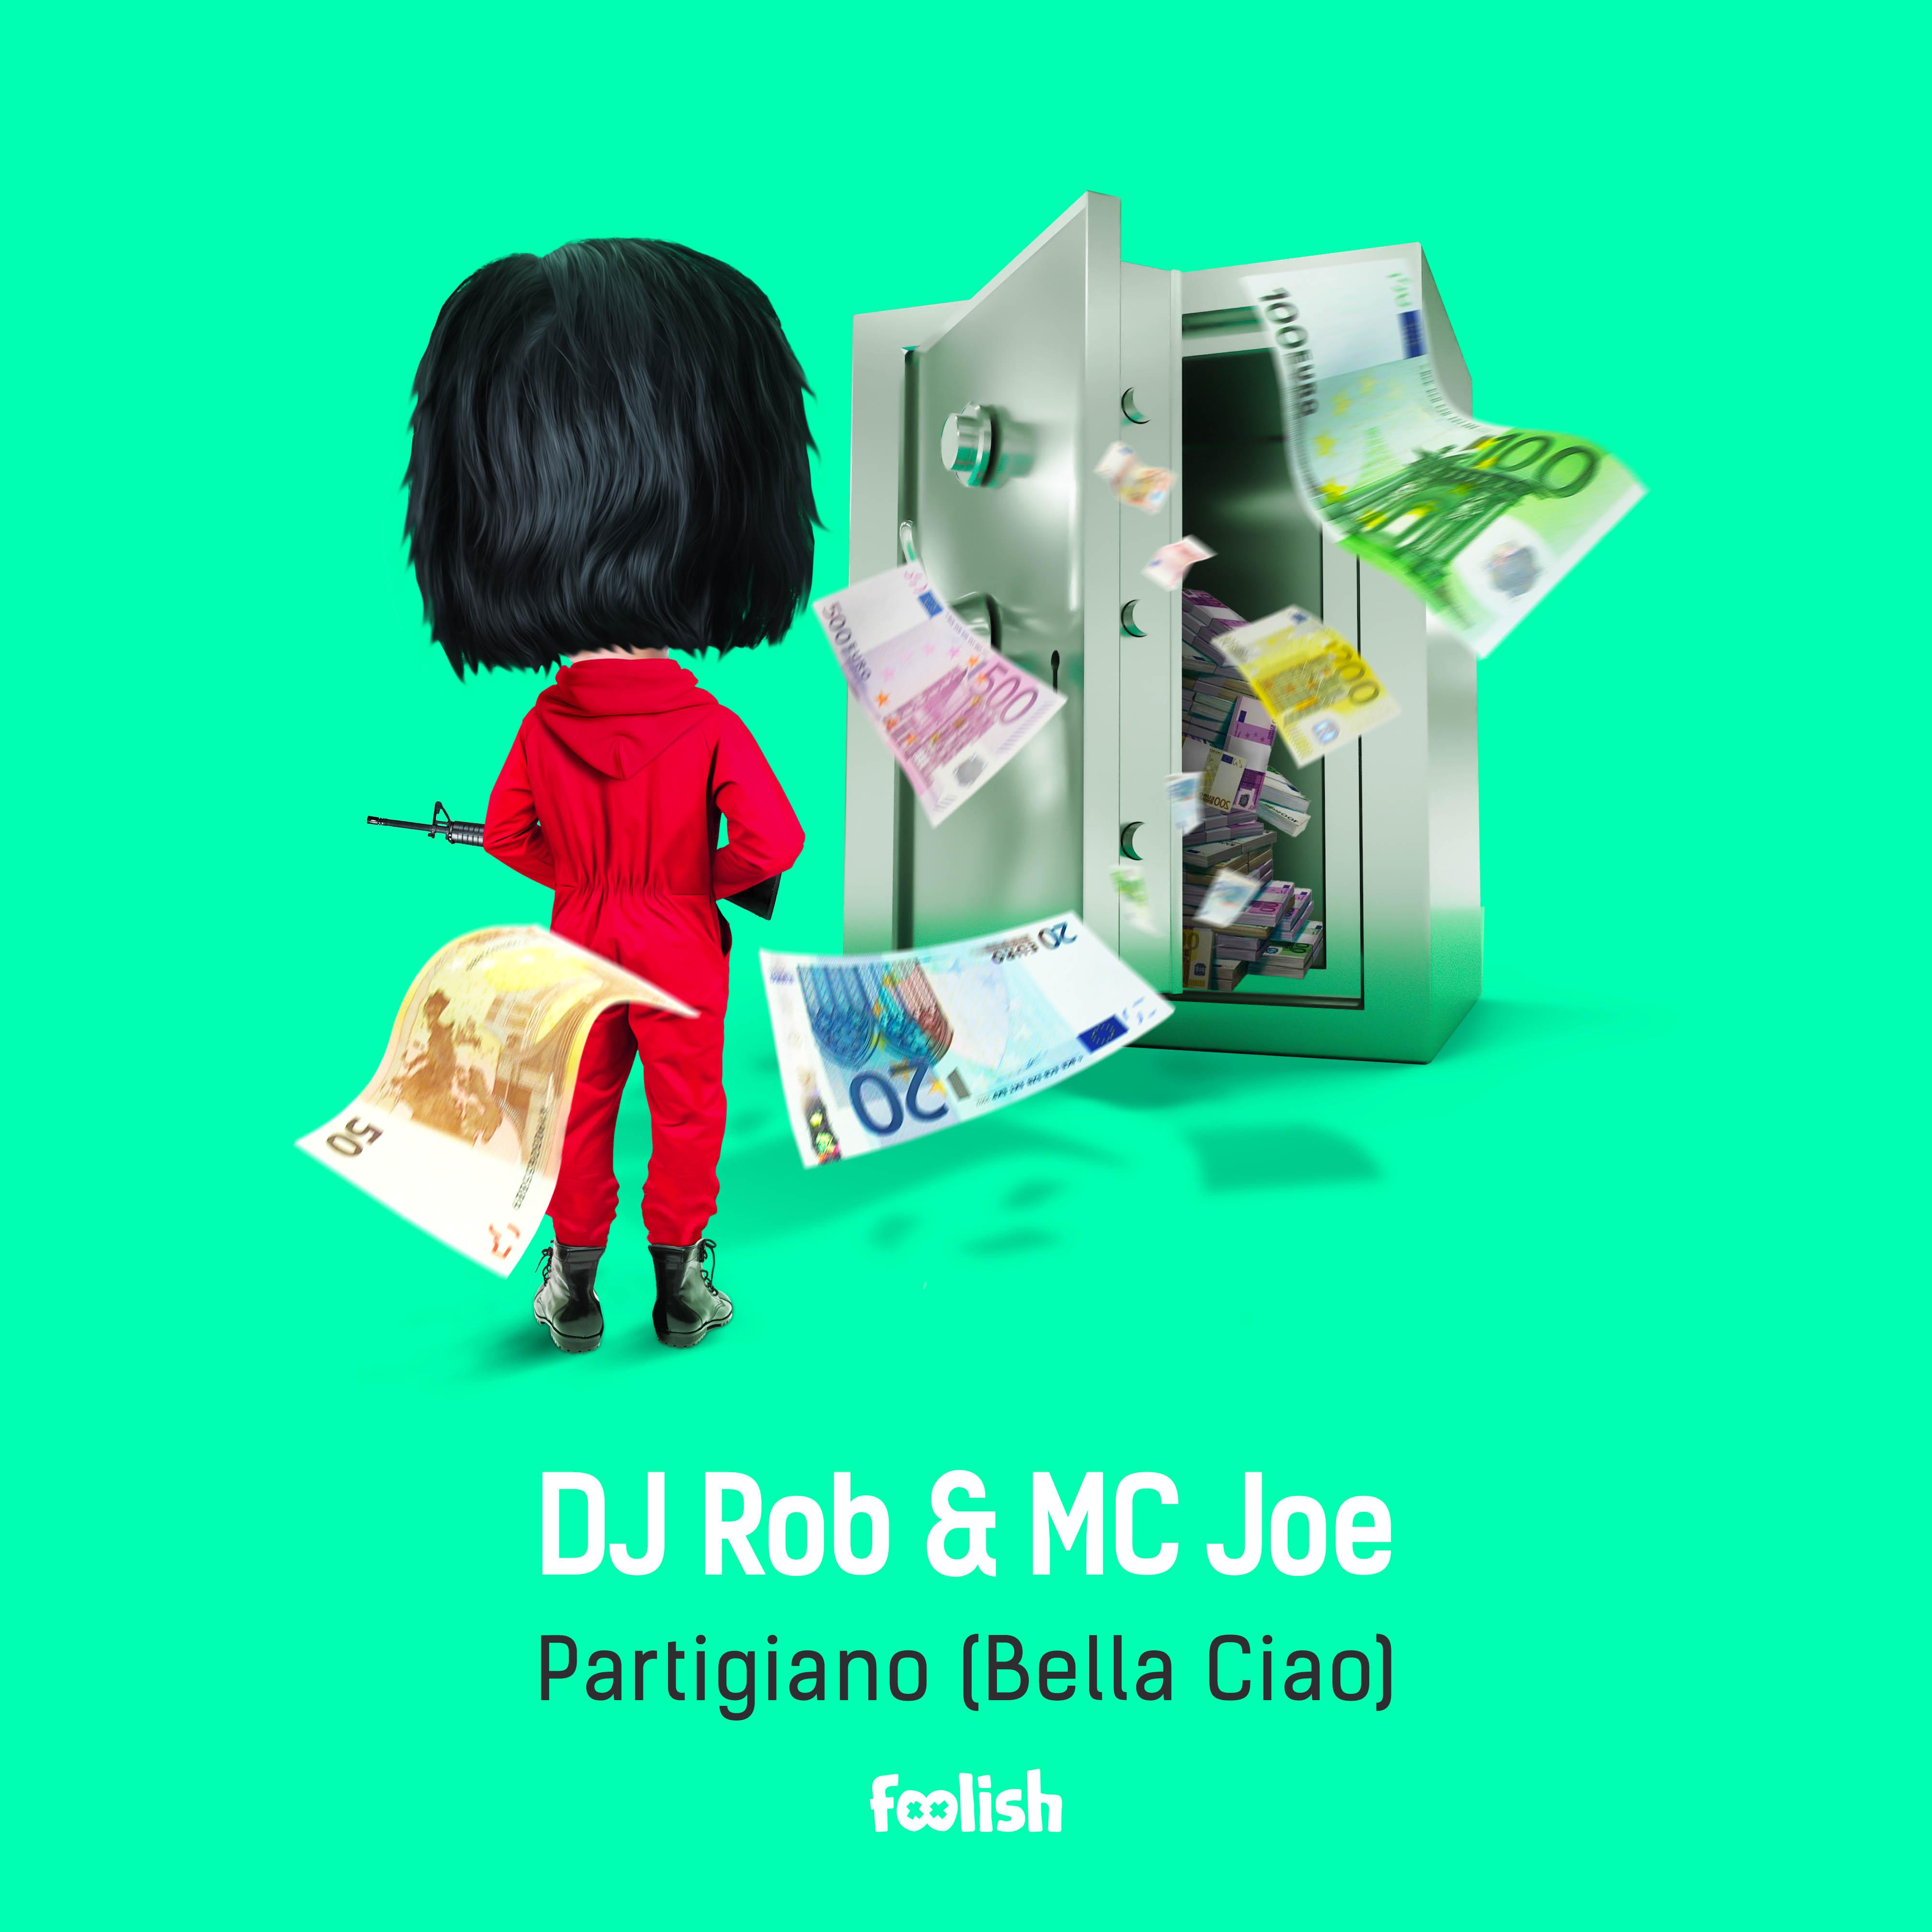 DJ Rob & MC Joe - Partigiano (Bella Ciao)